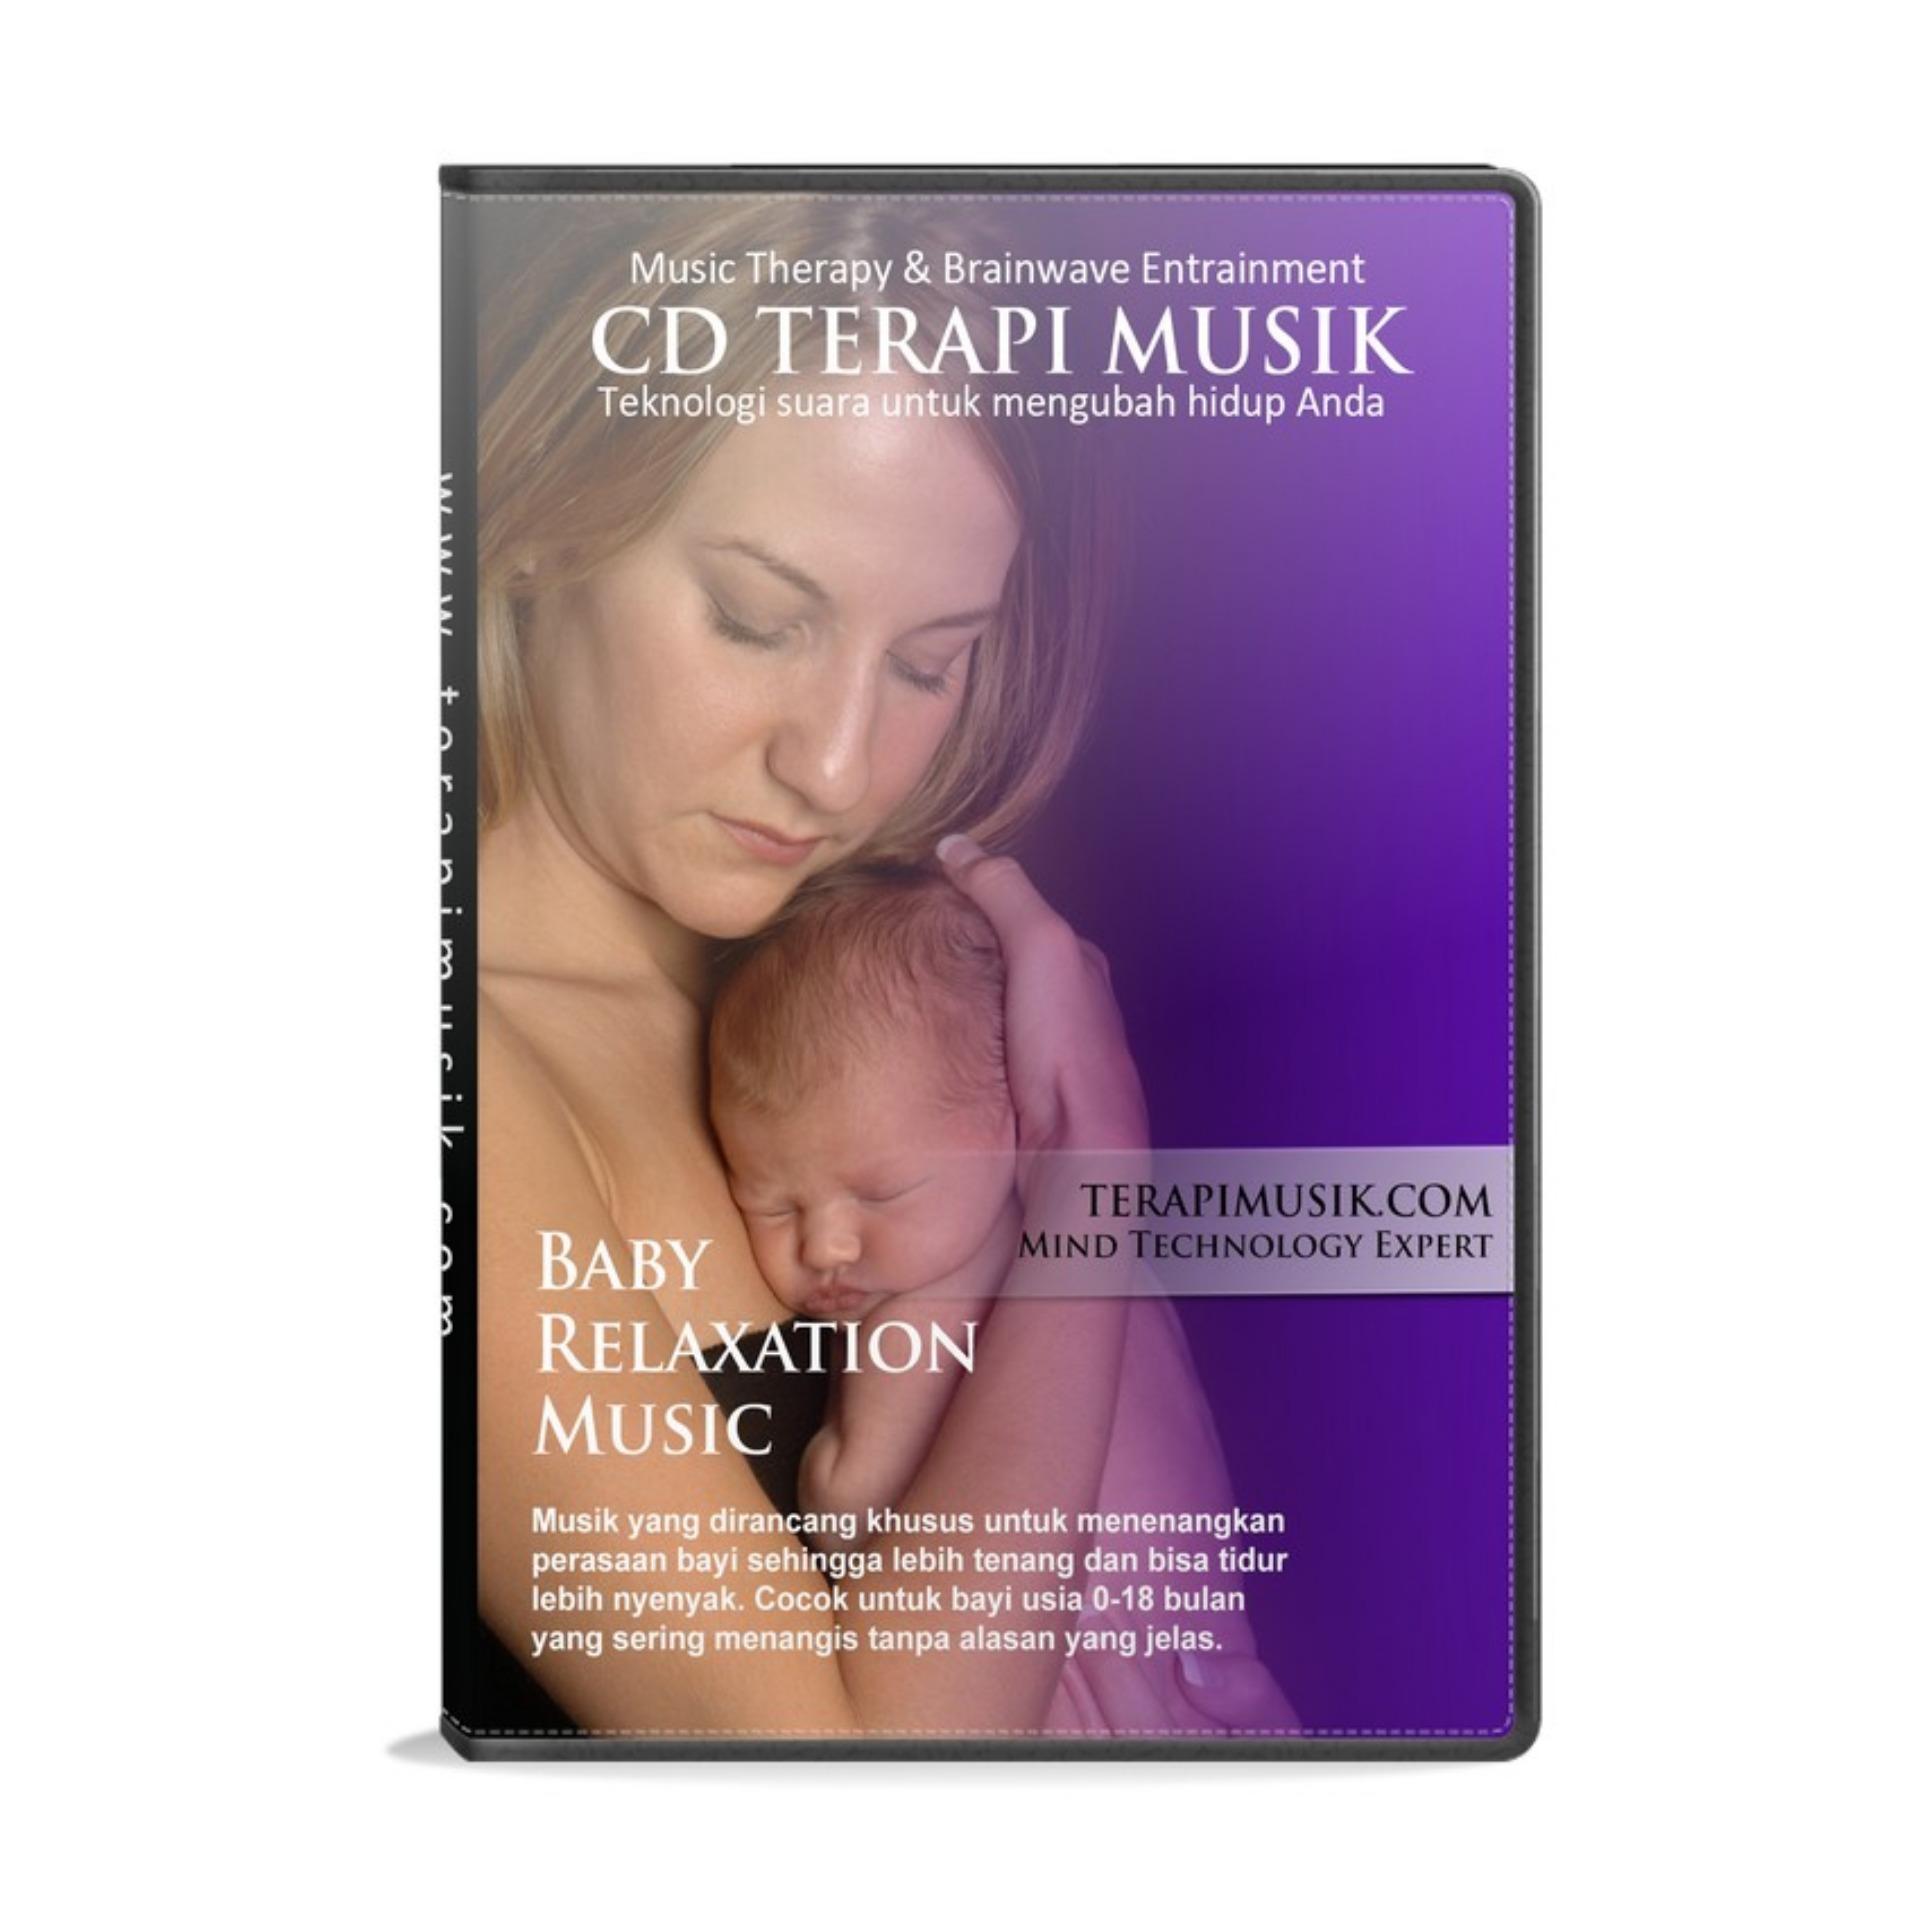 Terapi Musik Baby Relaxation Music (musik Relaksasi Untuk Bayi) By Terapi Musik.